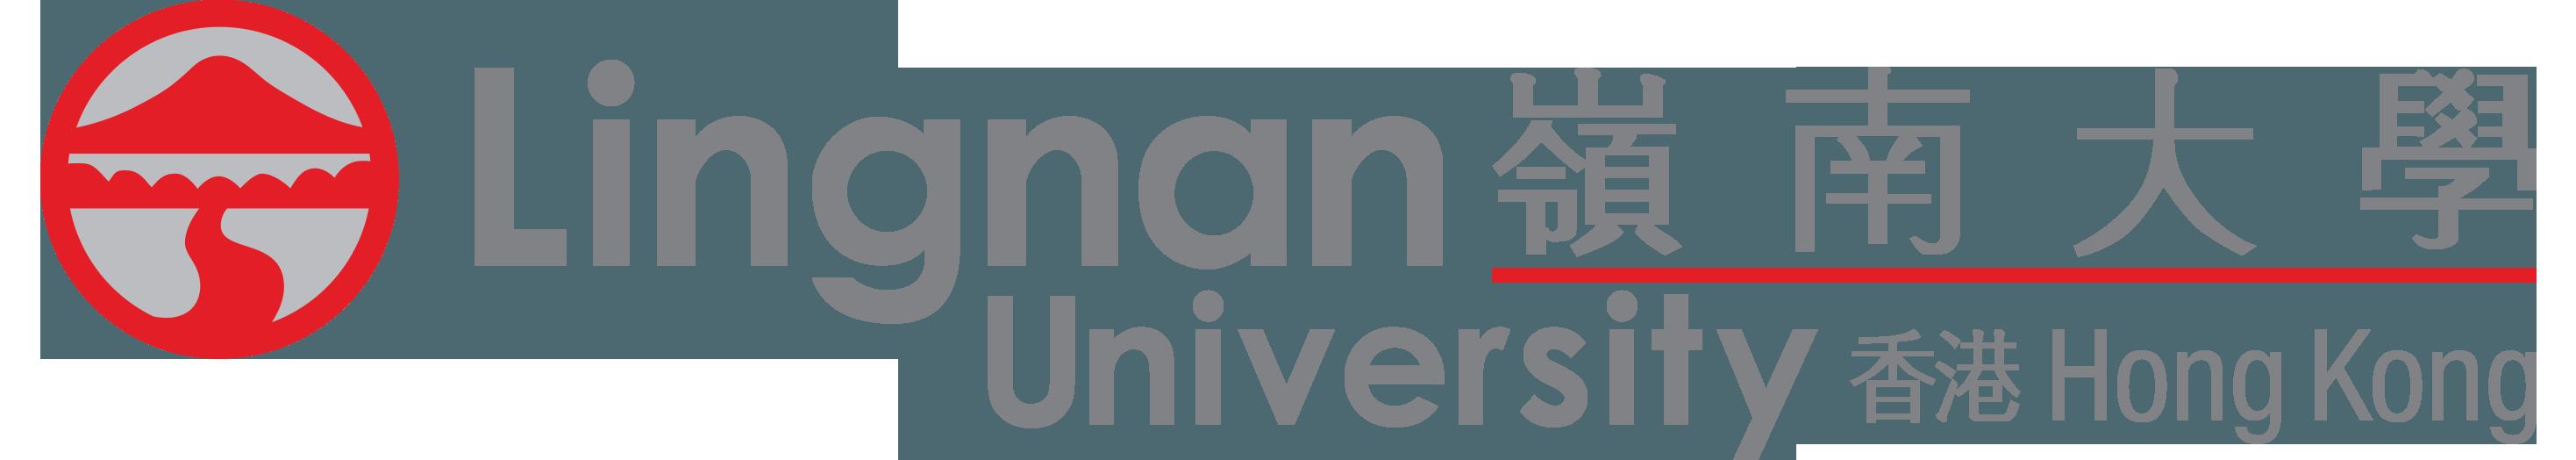 lingnan university 香港嶺南大學 Termsoup